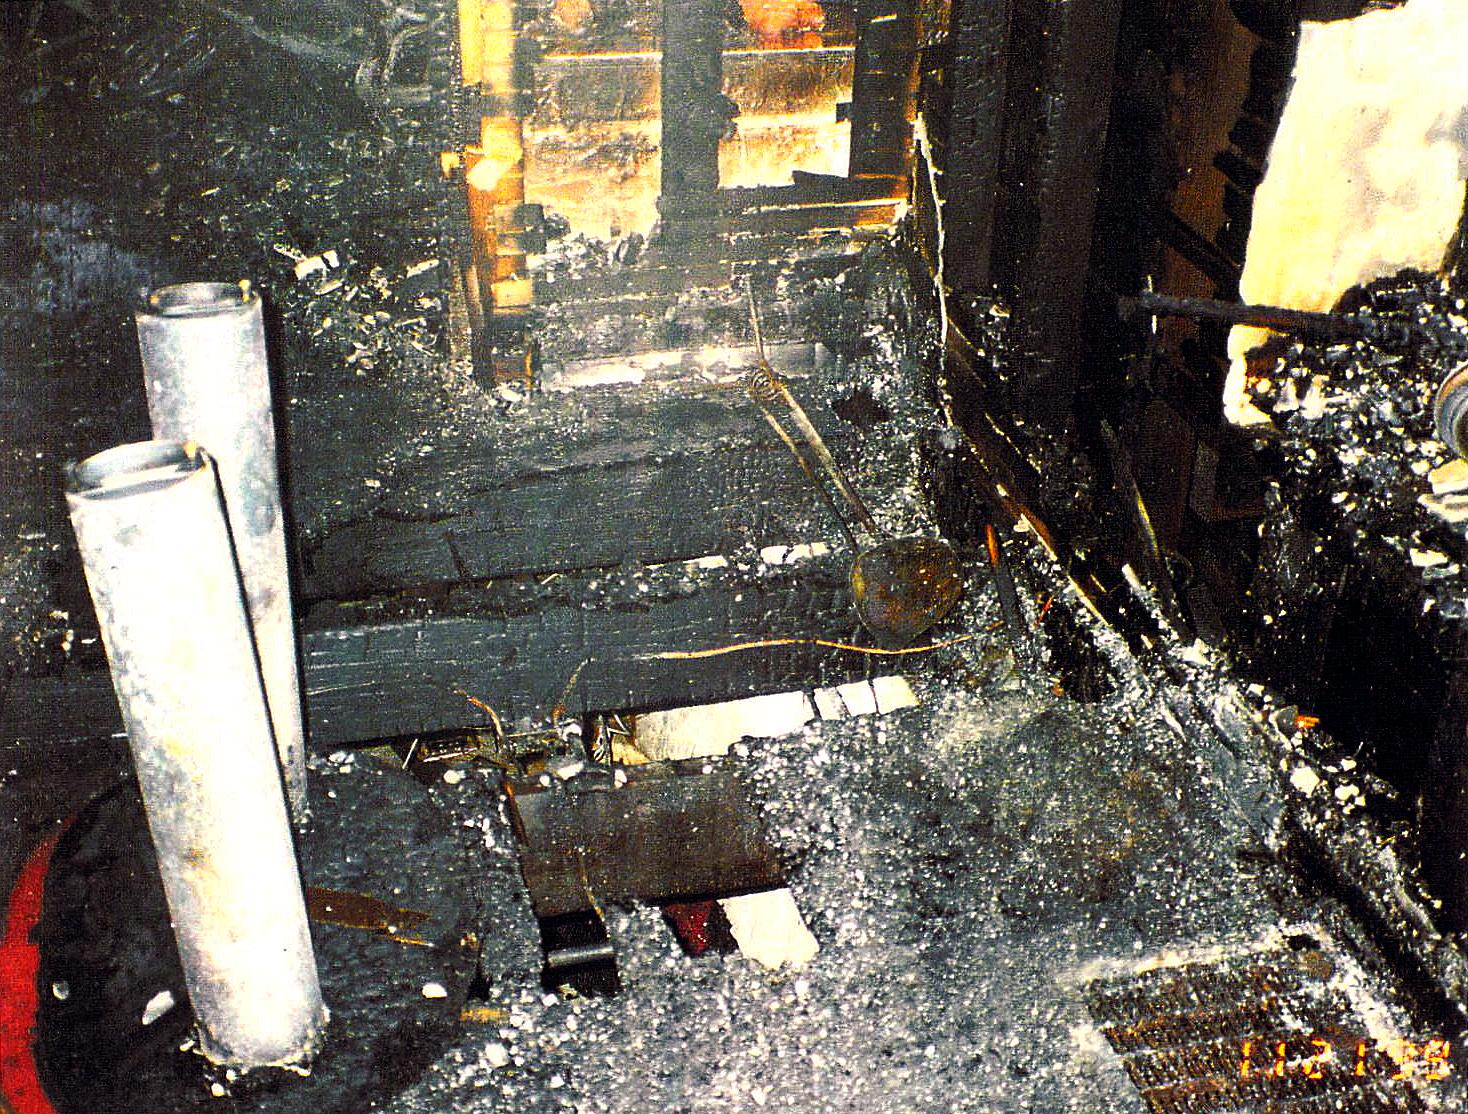 Angela-Garcia-ohio-arson-interior-damage-1488388594